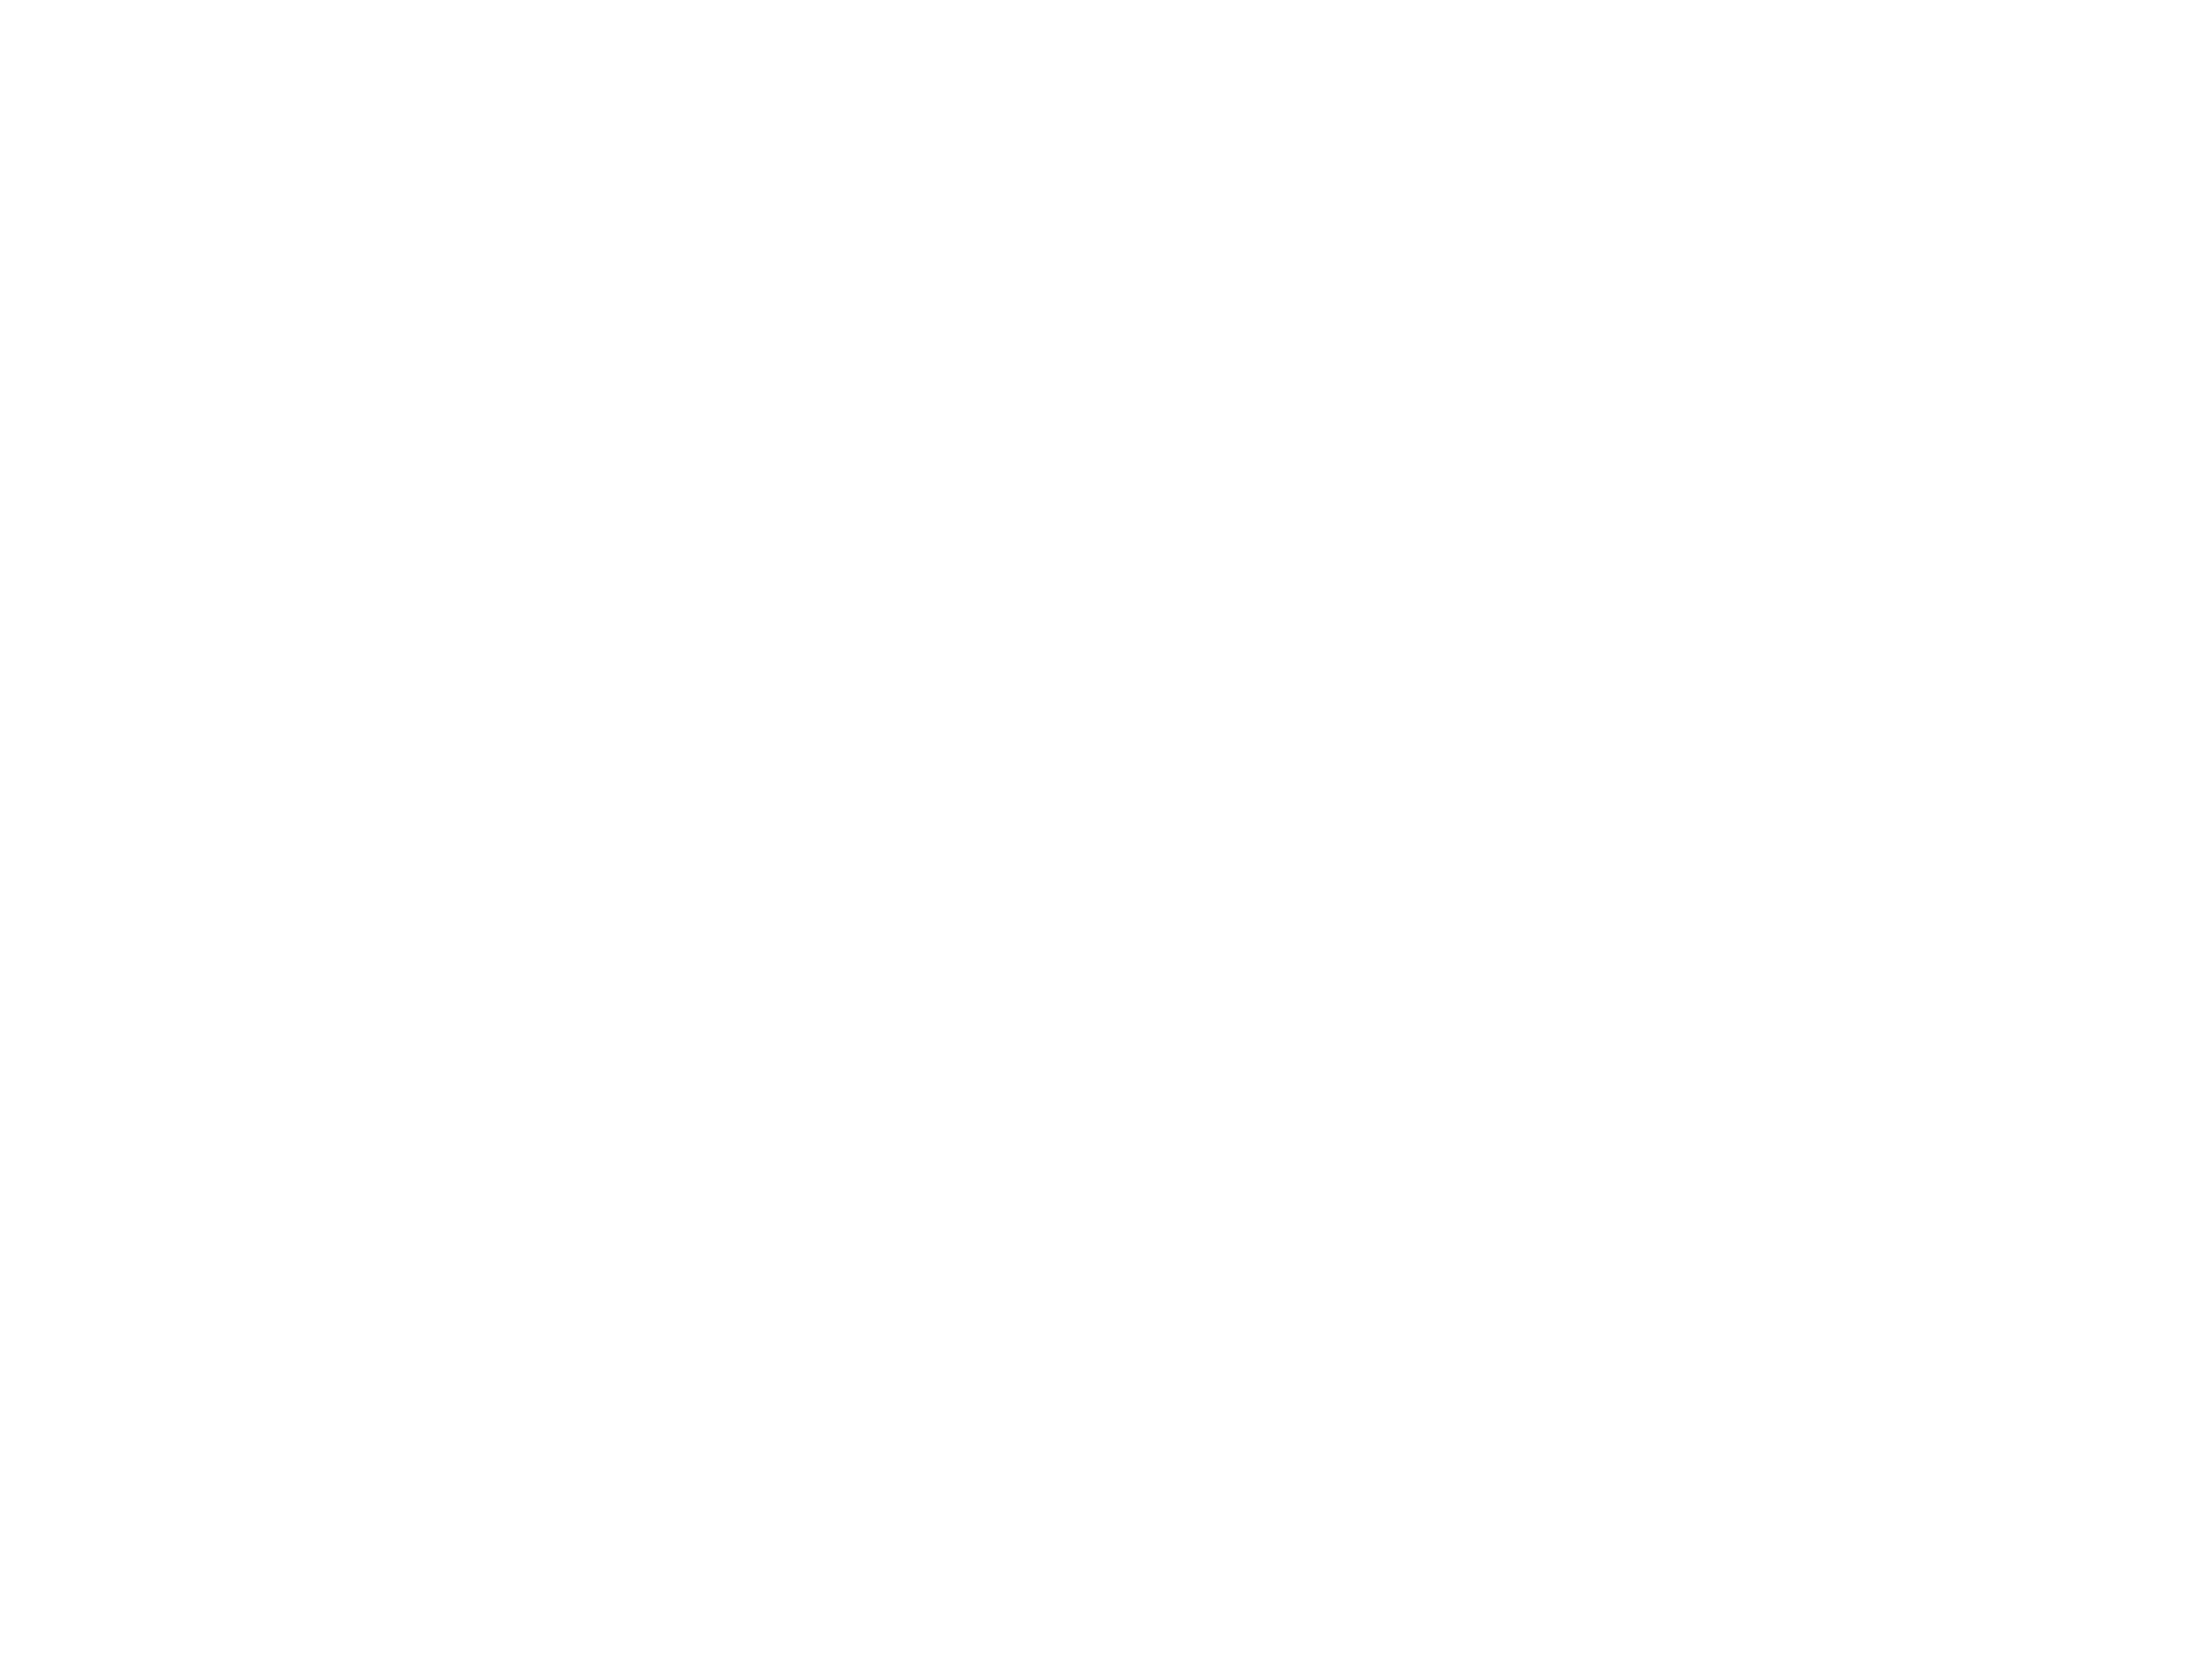 Snowflake Border Frame White Transparent PNG Clip Art.